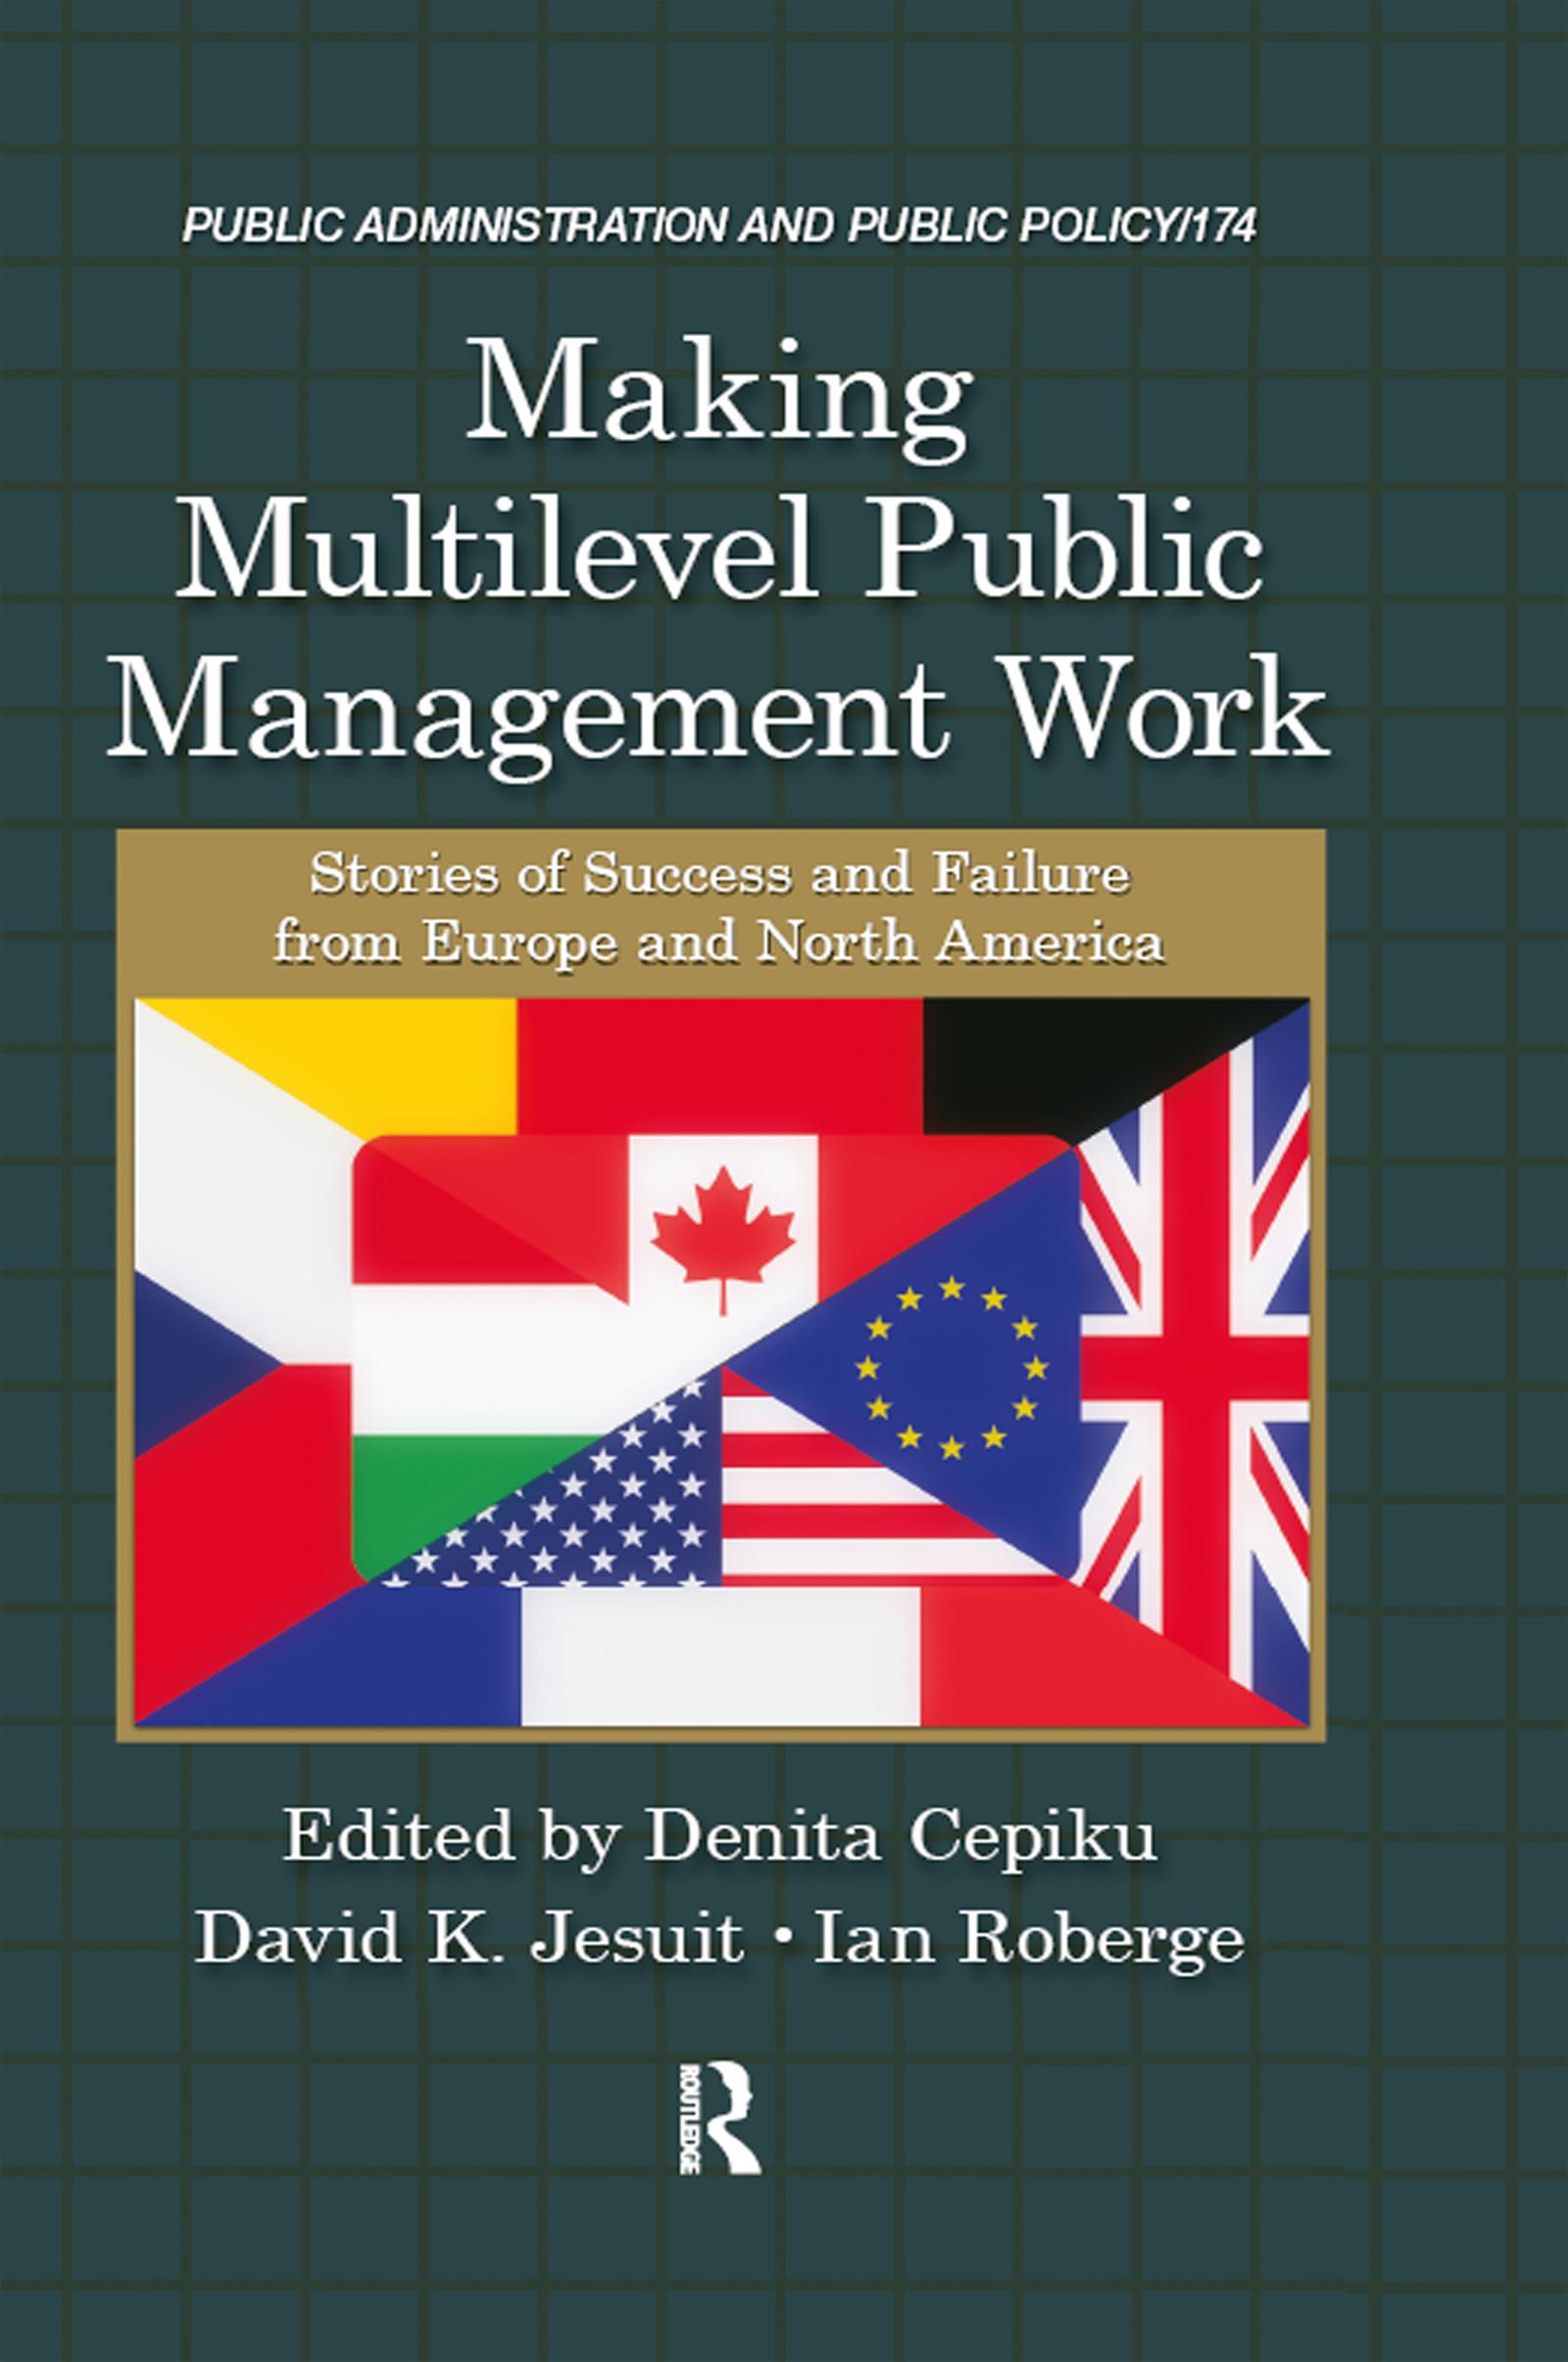 Making Multilevel Public Management Work